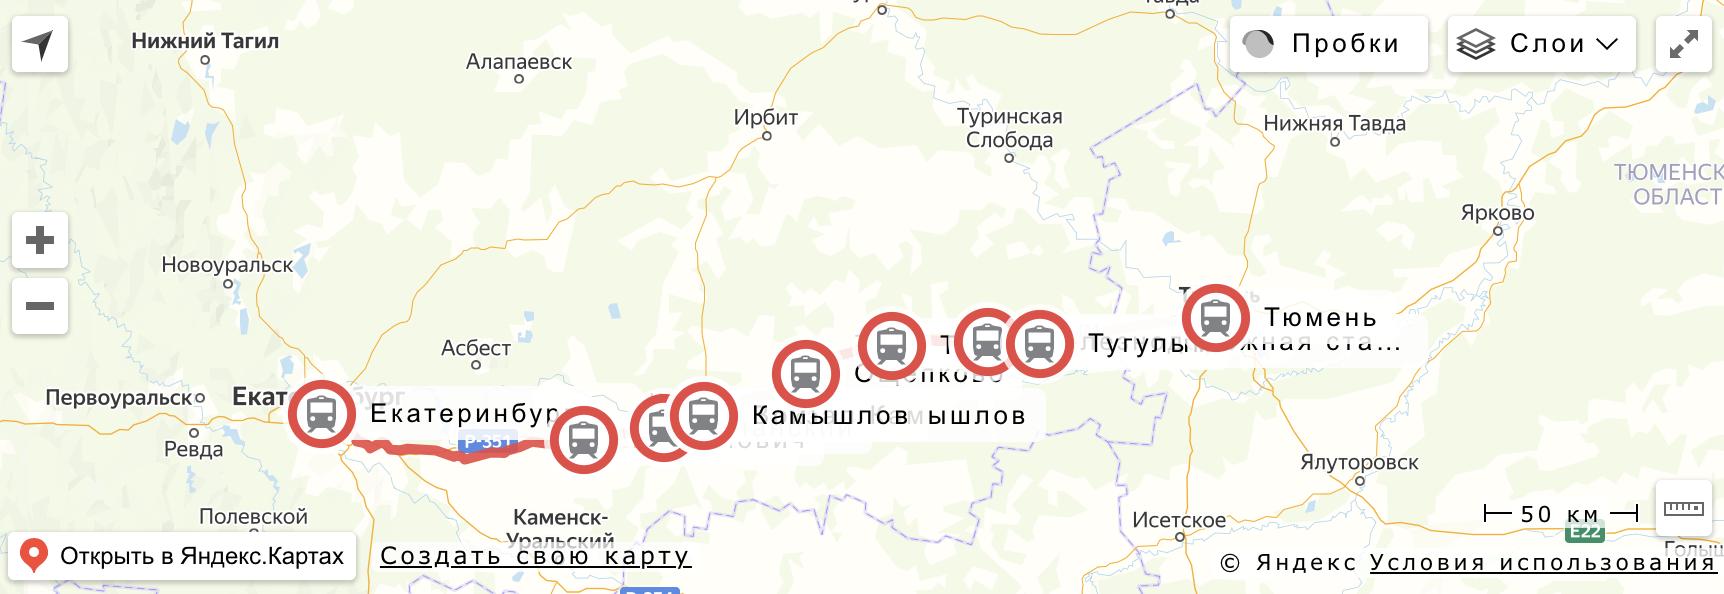 "Маршрут поезда ""Ласточка"" Пермь - Екатеринбург"